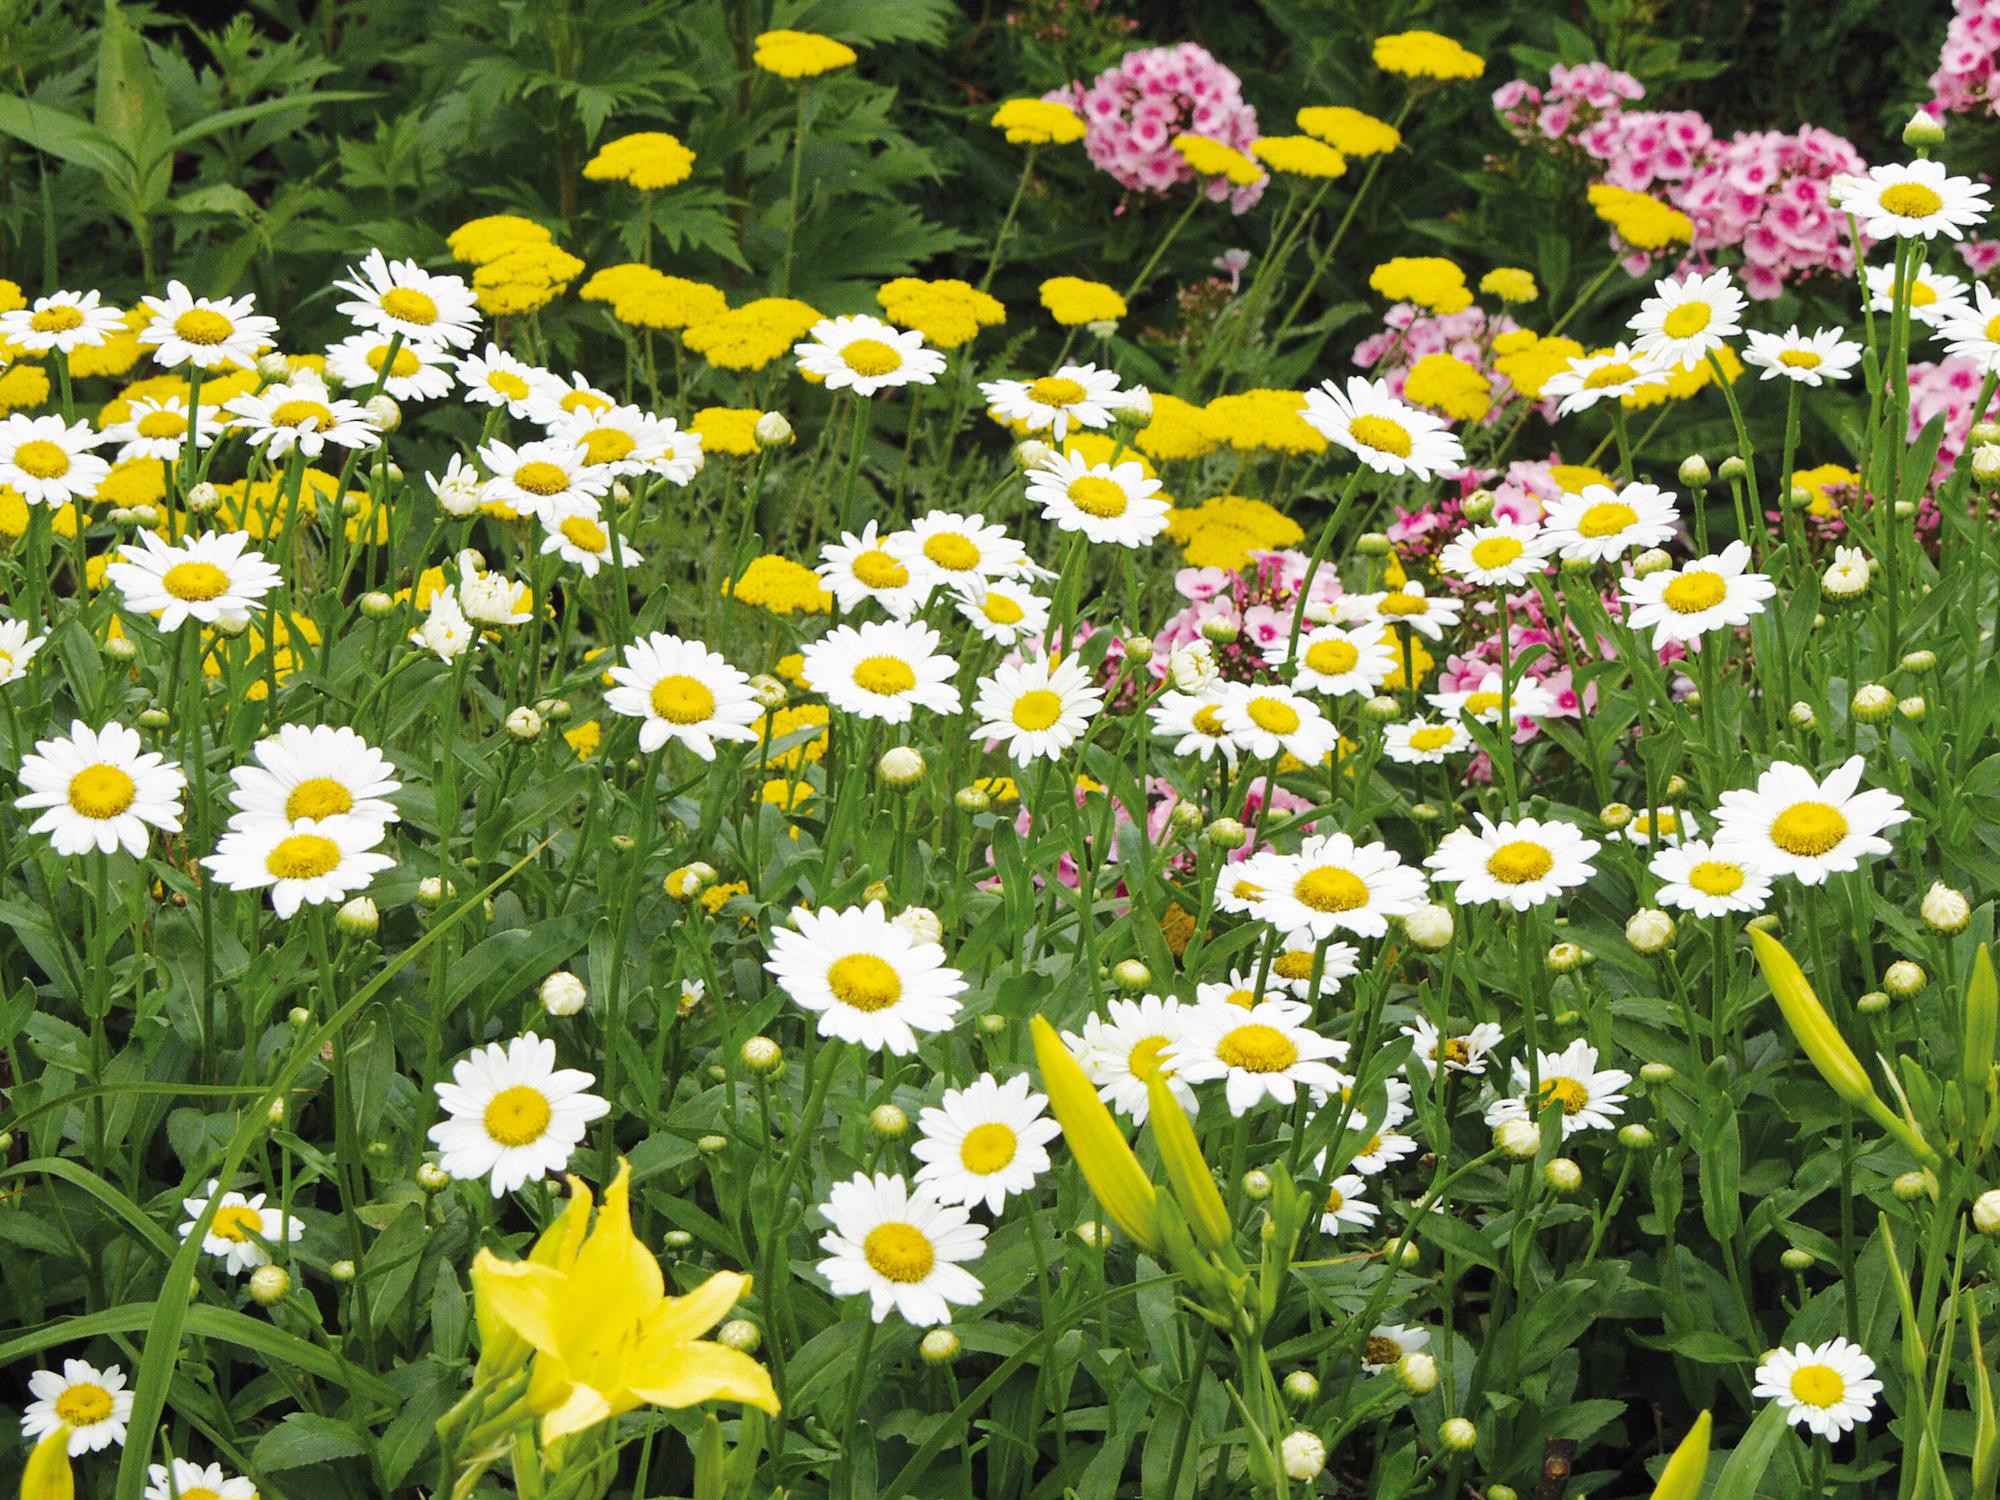 Vaste Planten Tuin : Droogte reddingsplan voor je tuin tuintips tuinhappy